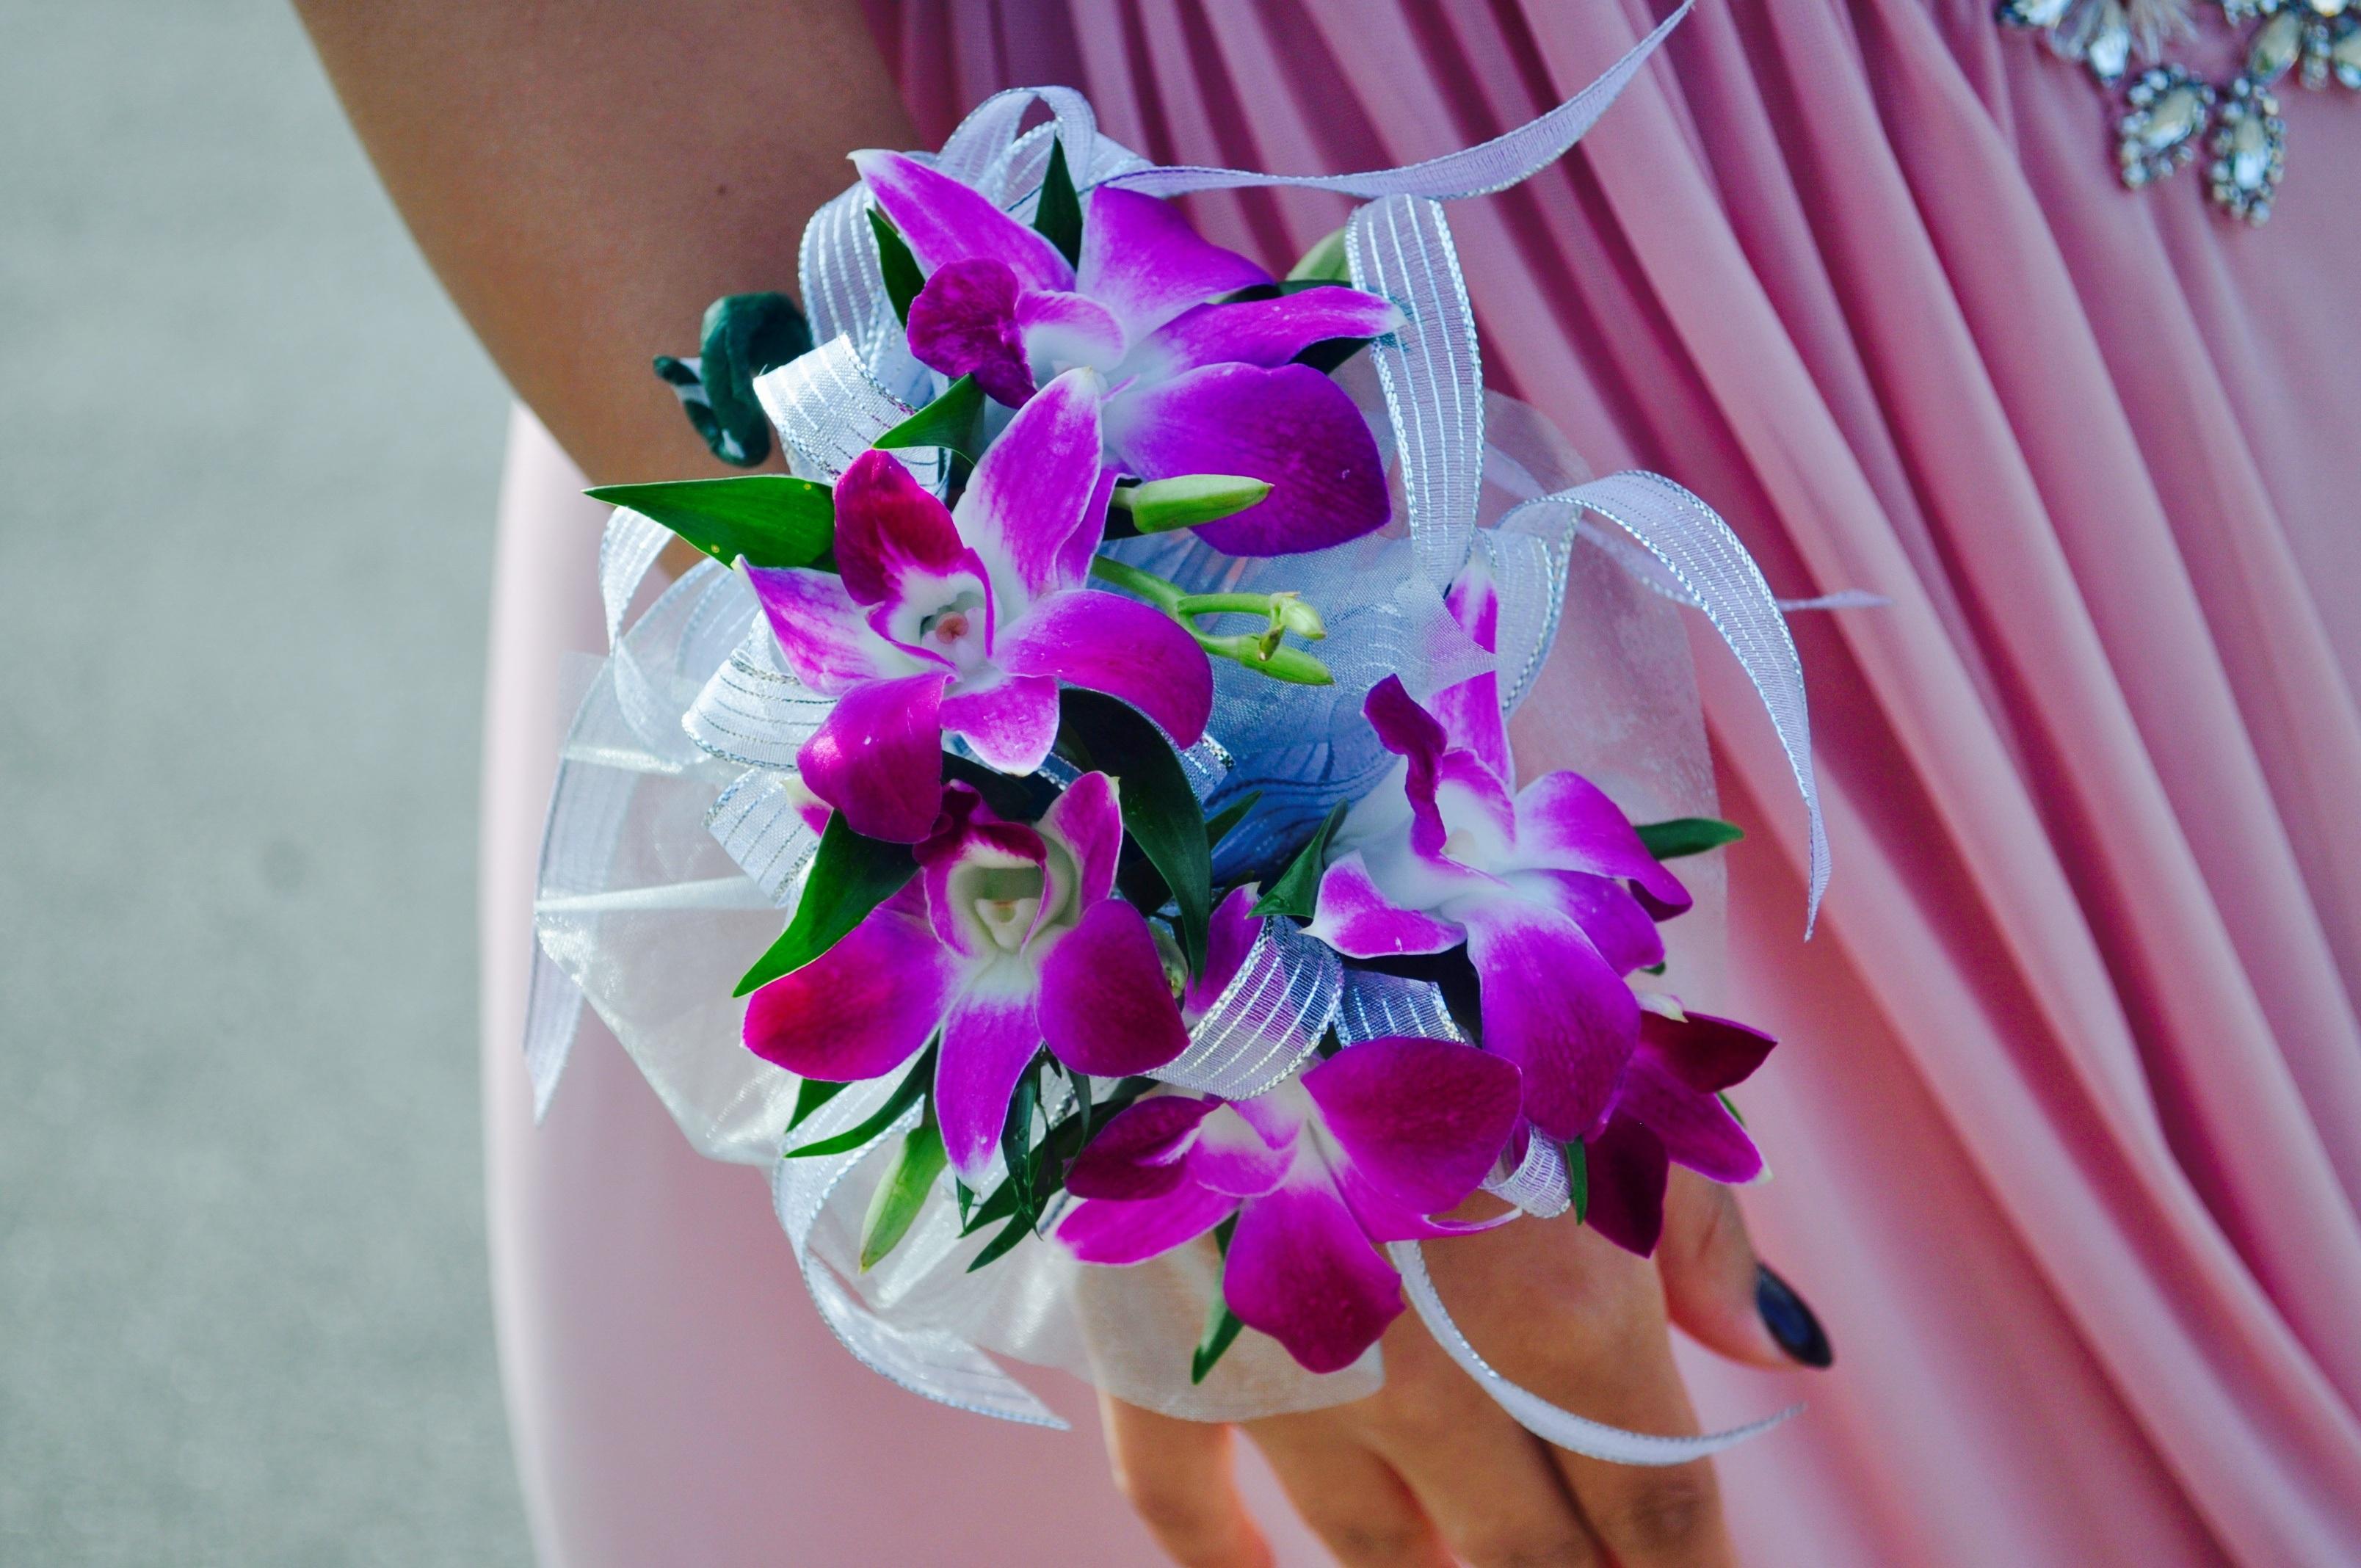 Fotos gratis : niña, flor, púrpura, pétalo, floral, hembra ...